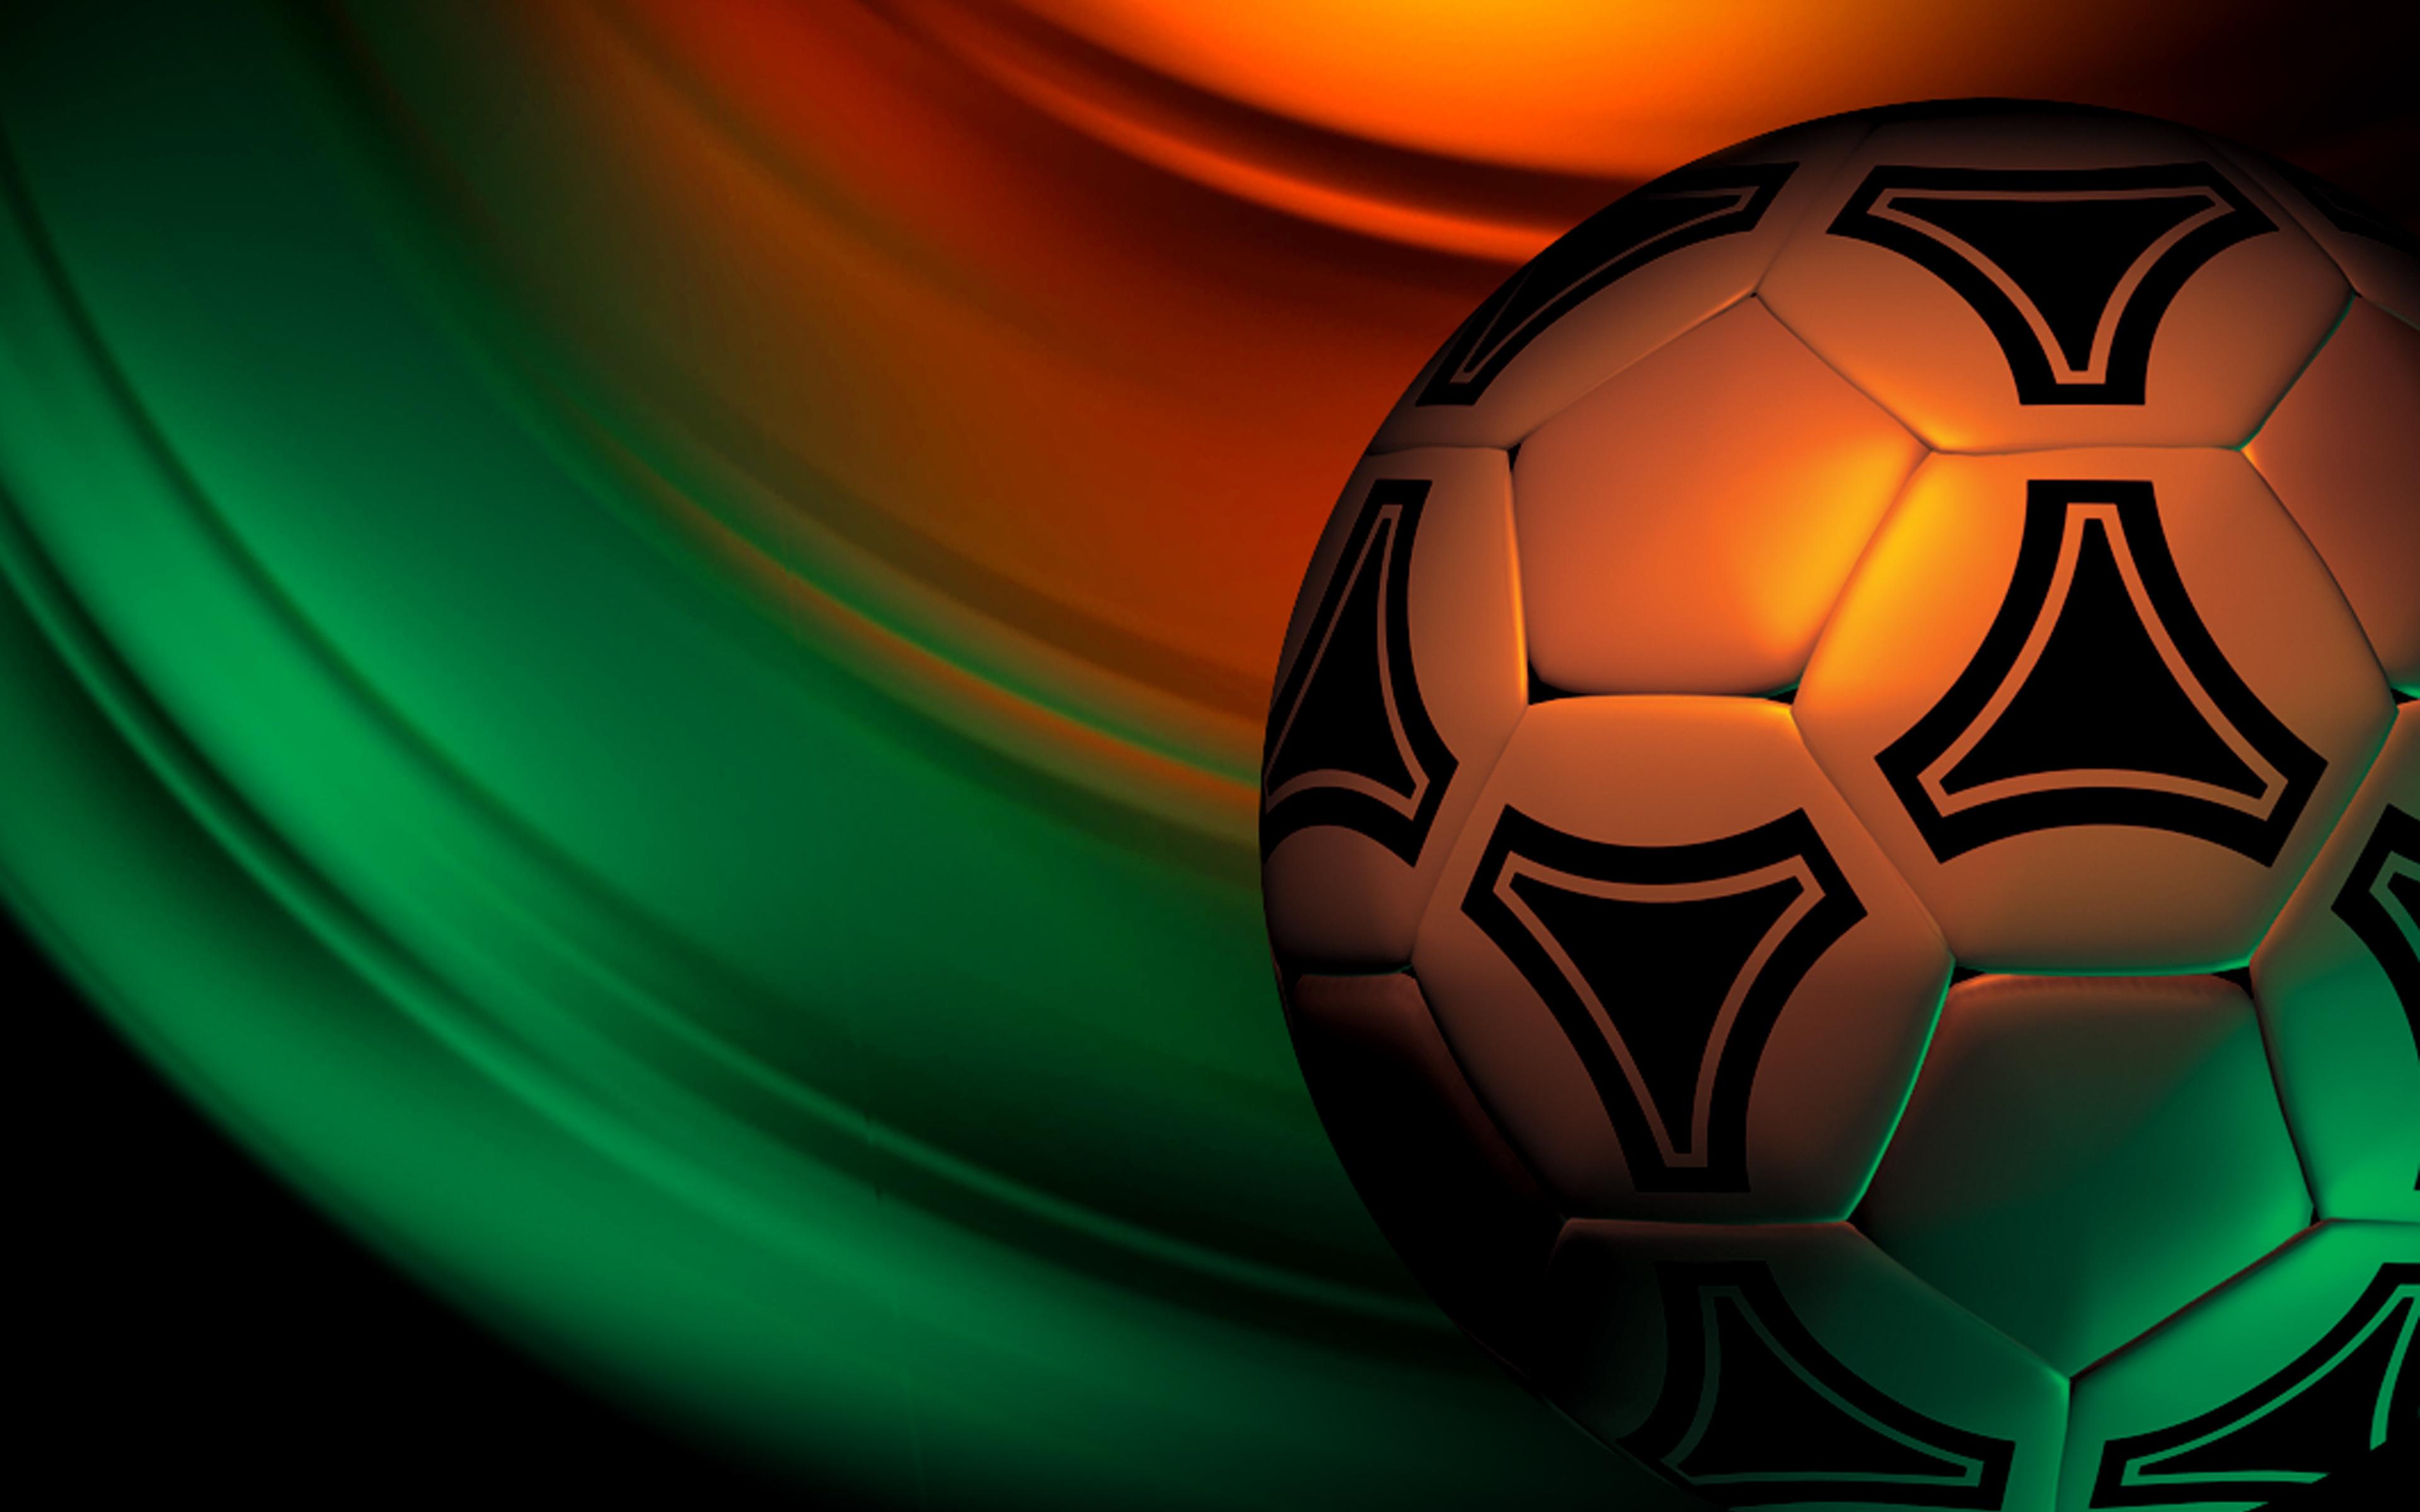 soccer-4k-abstract-background-ri.jpg